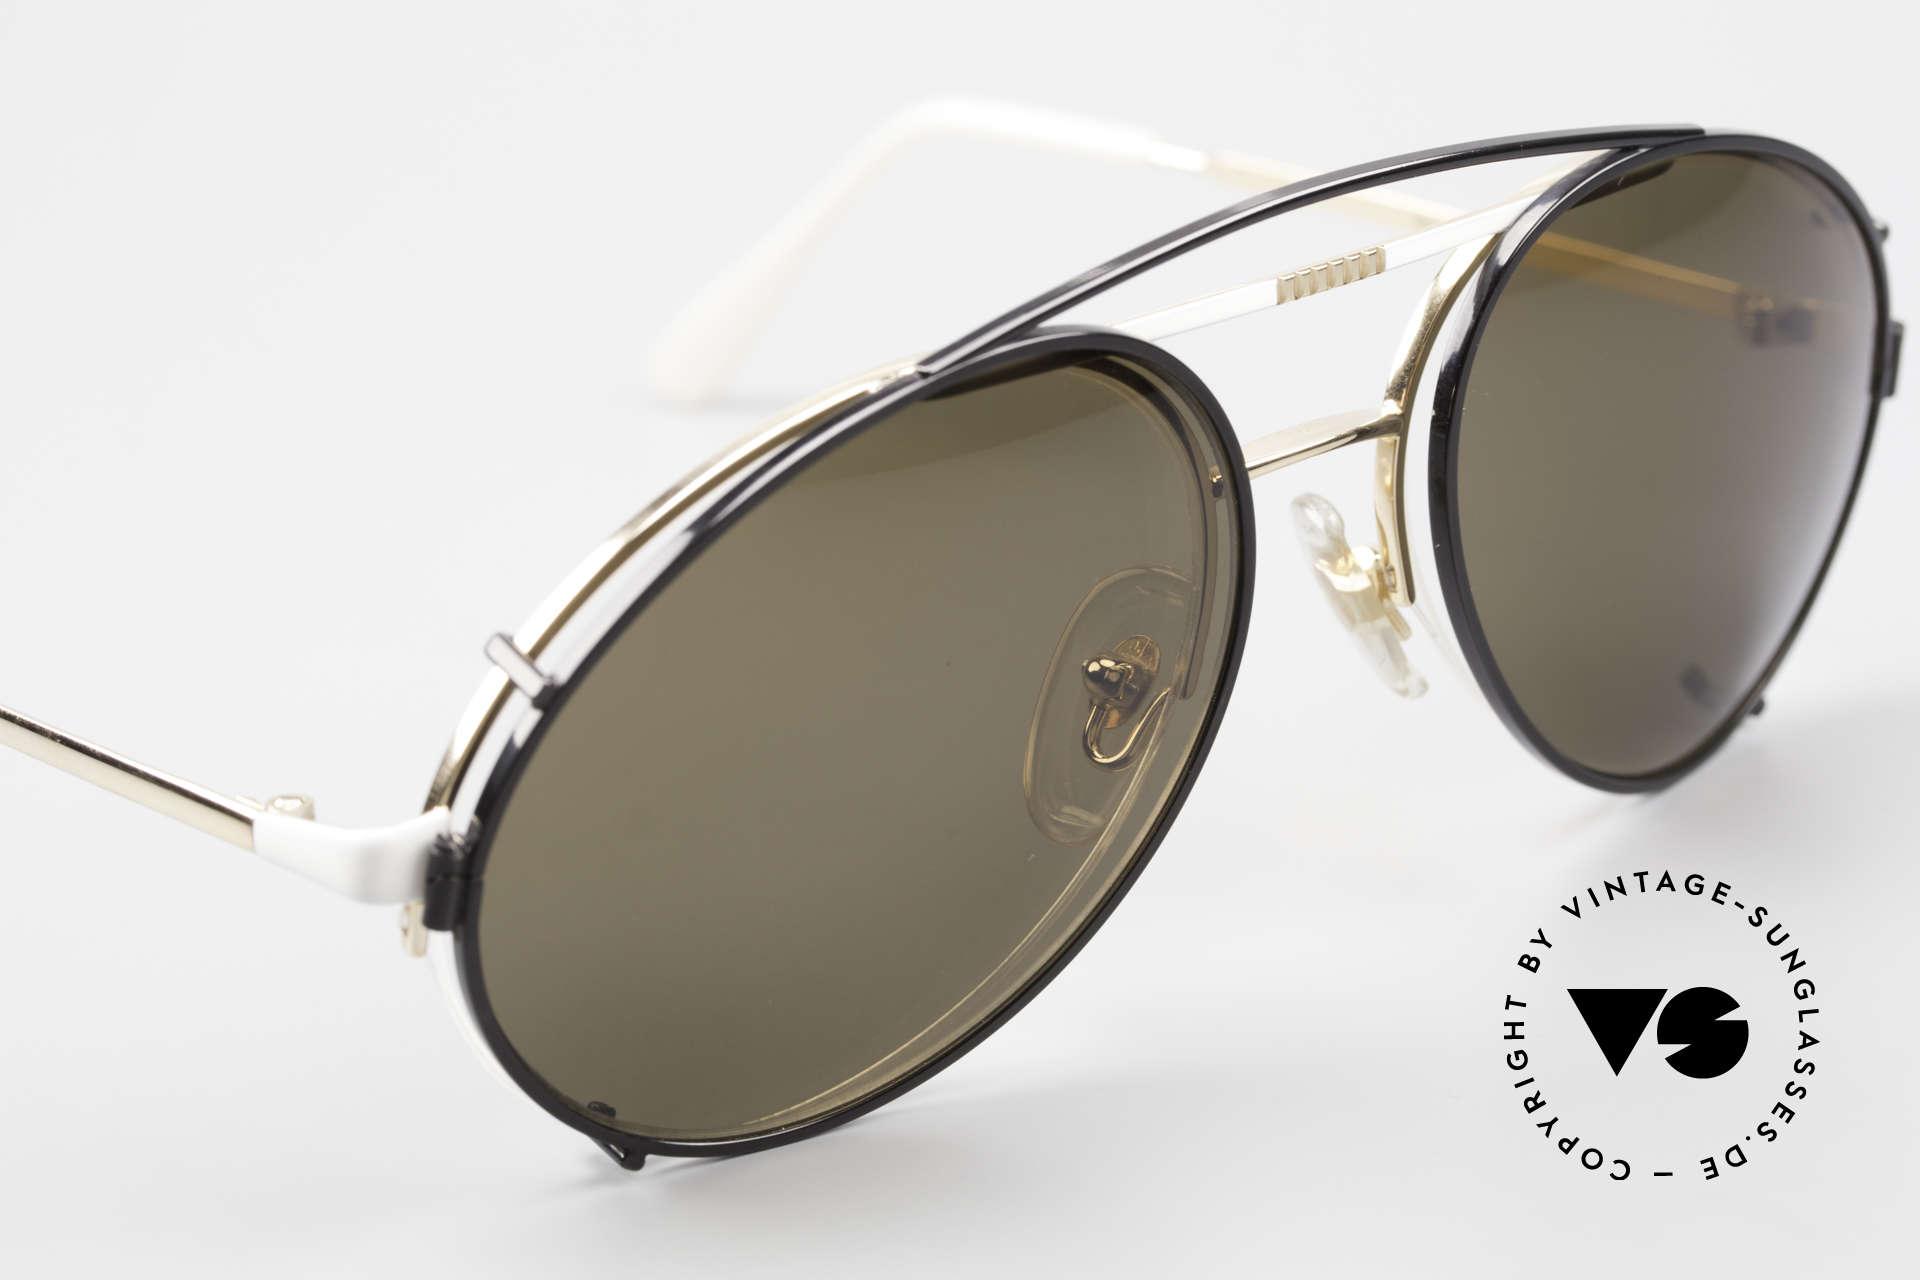 Bugatti 65787 Semi Rimless Frame With Clip, unworn (like all our rare vintage Bugatti eyewear), Made for Men